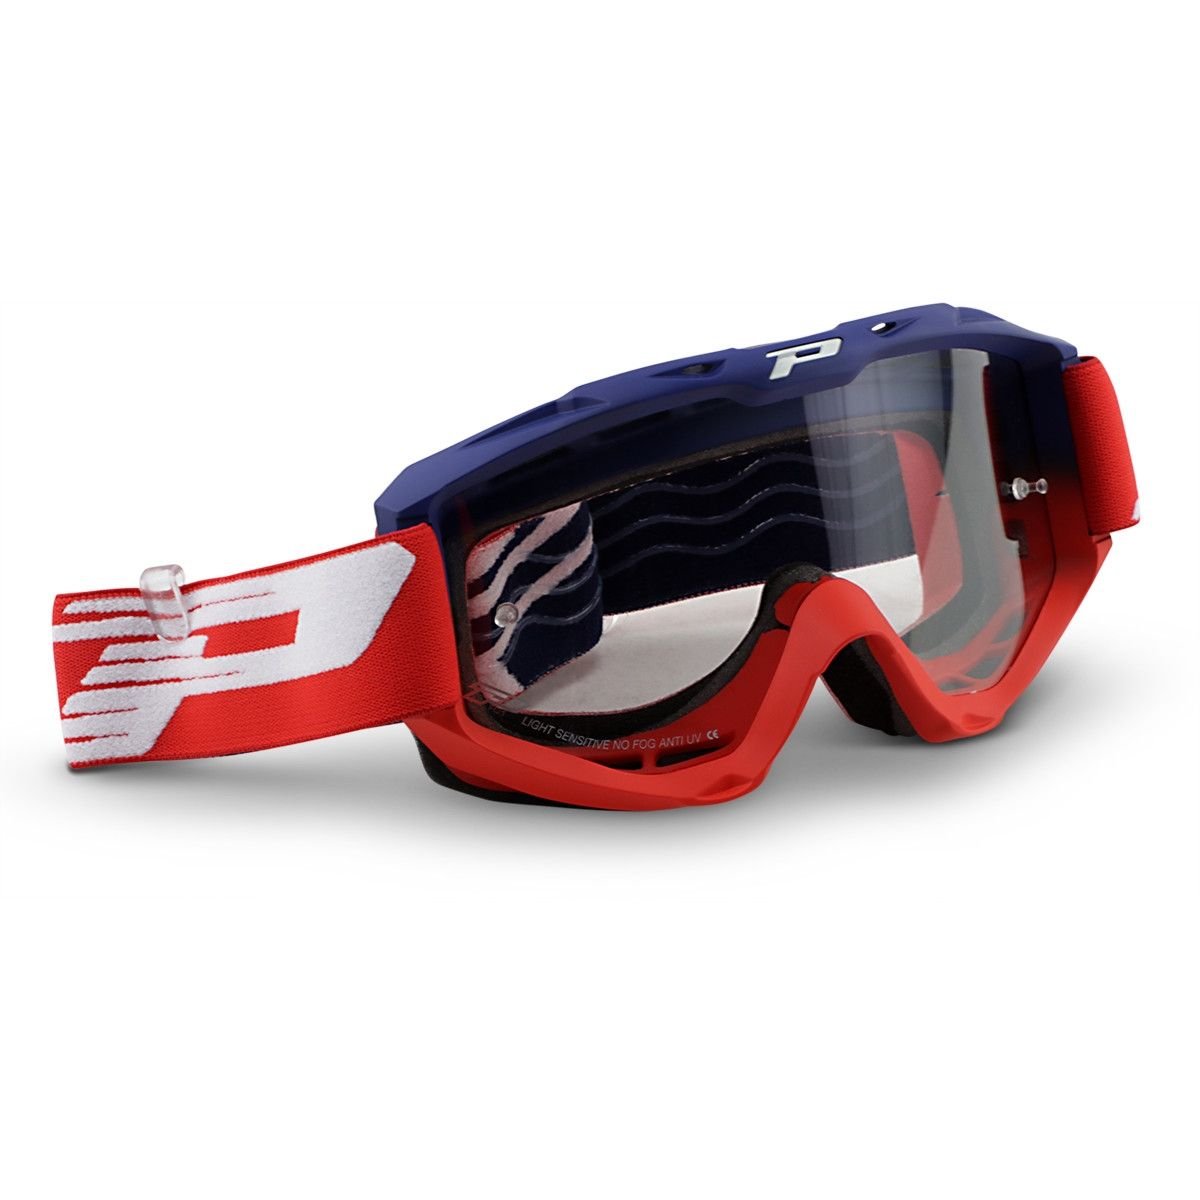 Progrip Crossbril 3450 Light Sensitive Riot Blue/Red